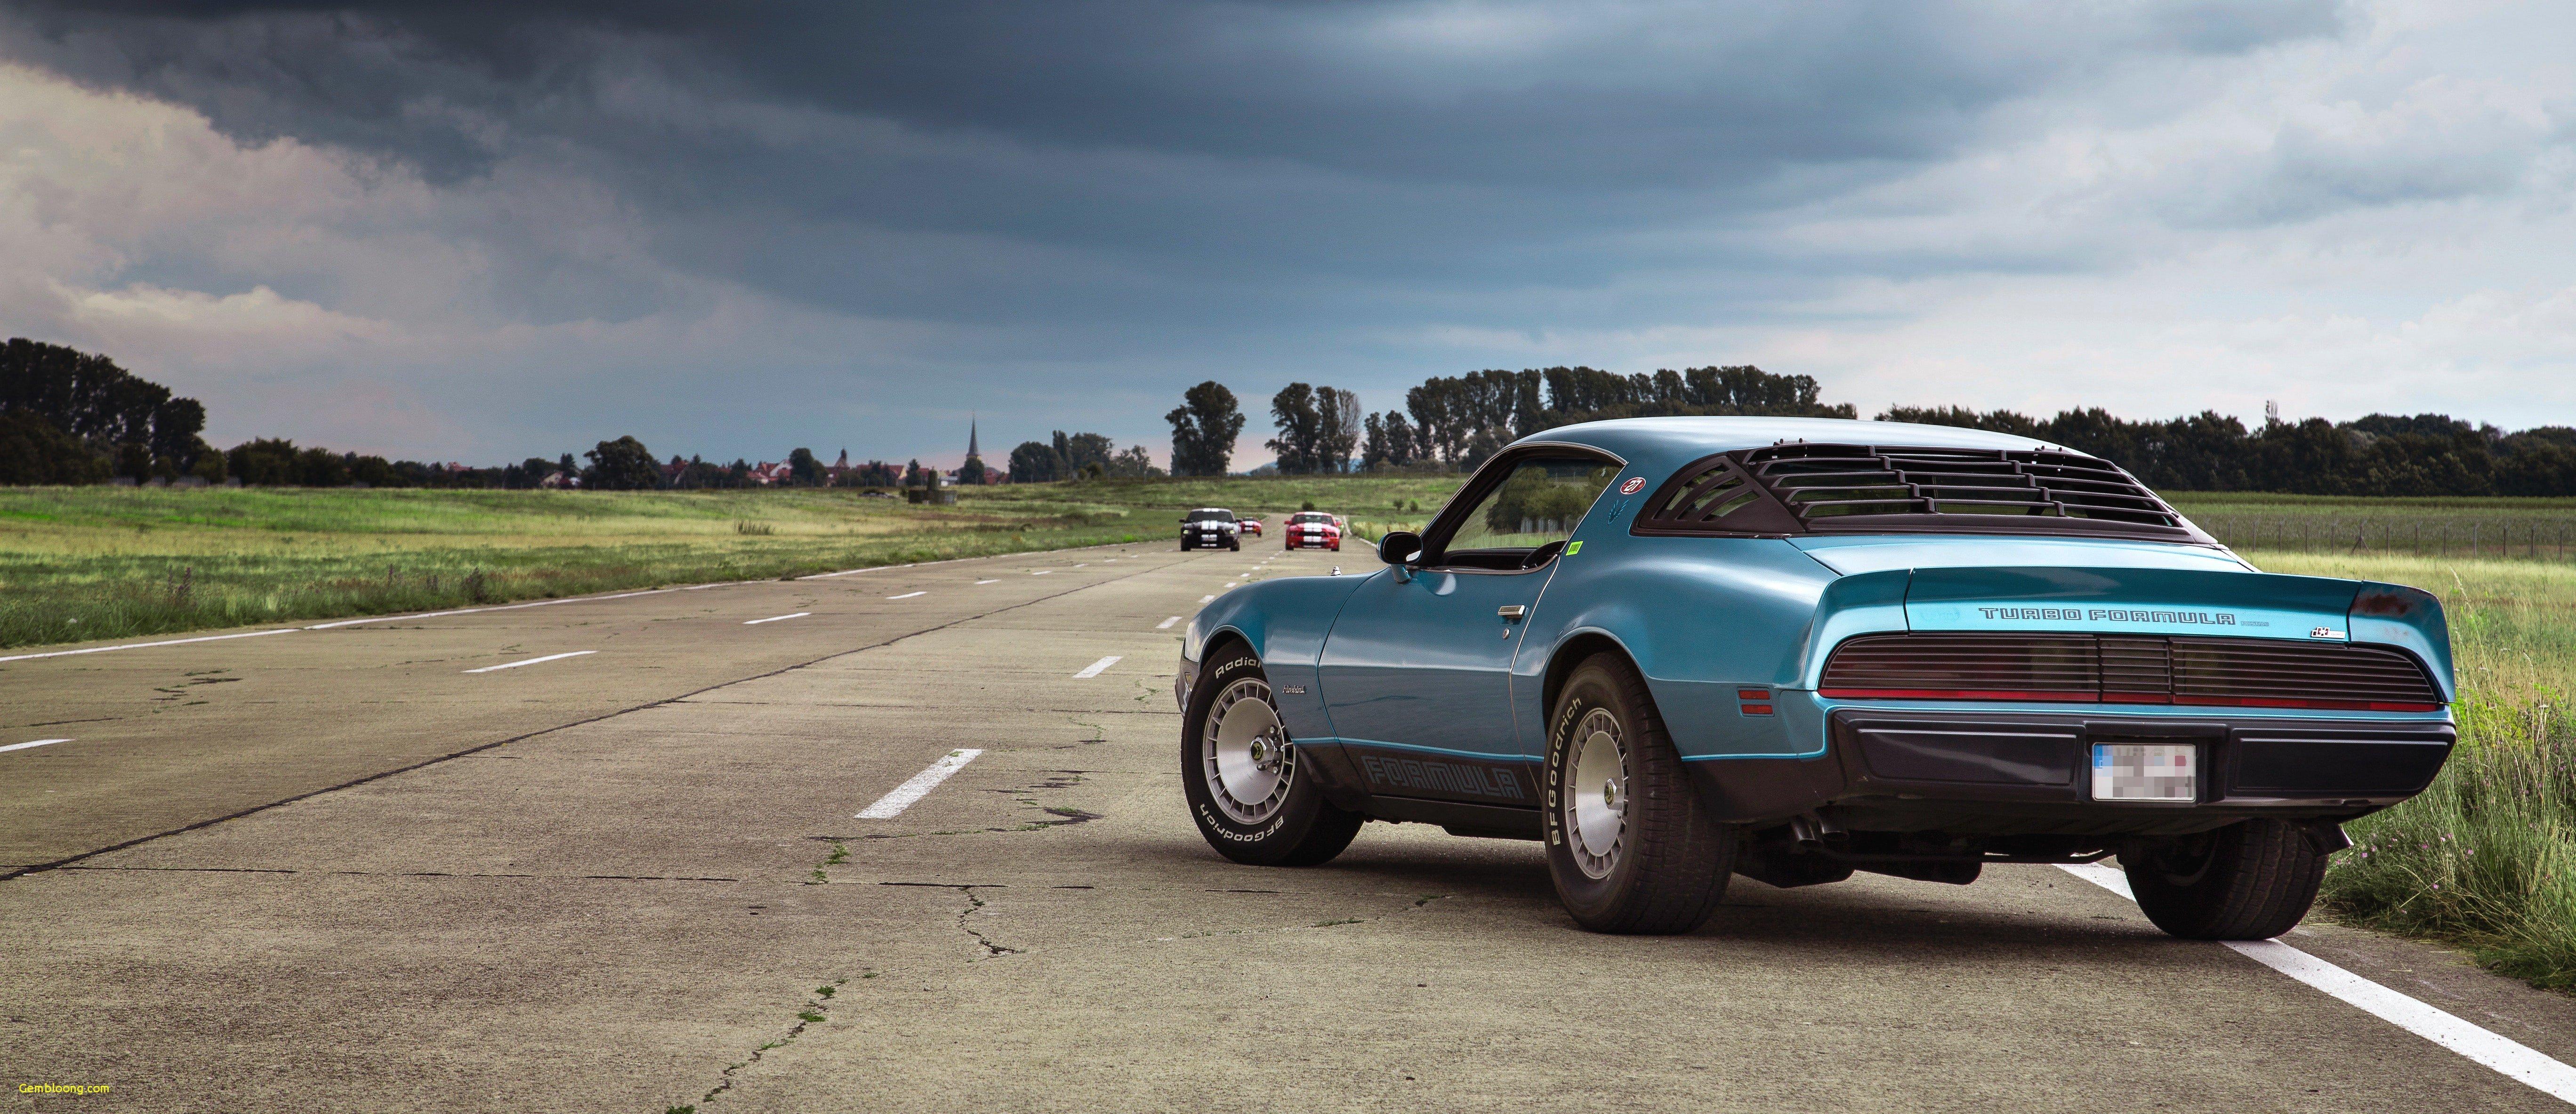 17+ Muscle Cars 4K Wallpapers on WallpaperSafari